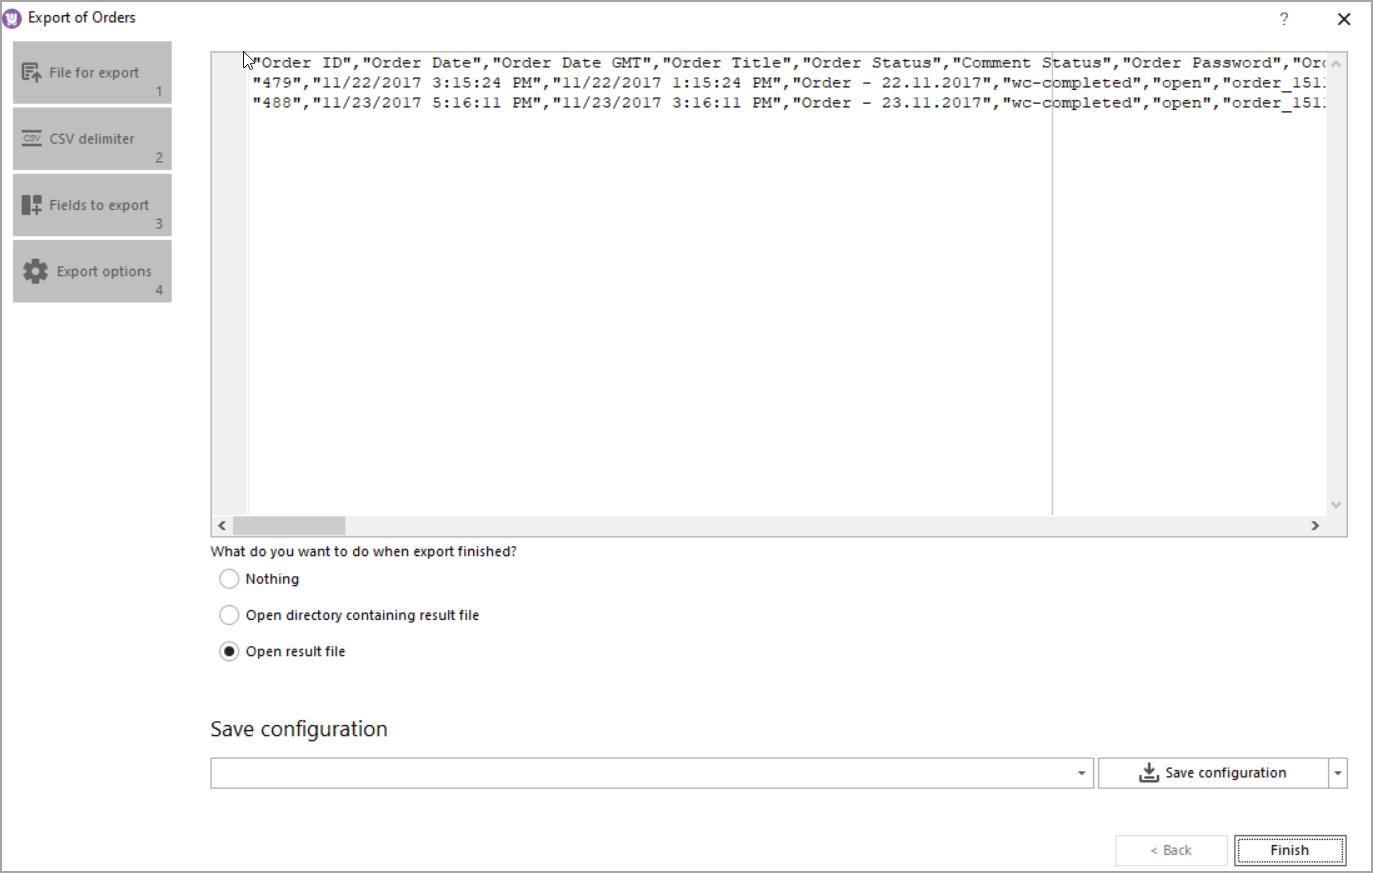 WooCommerce Order Export Finish